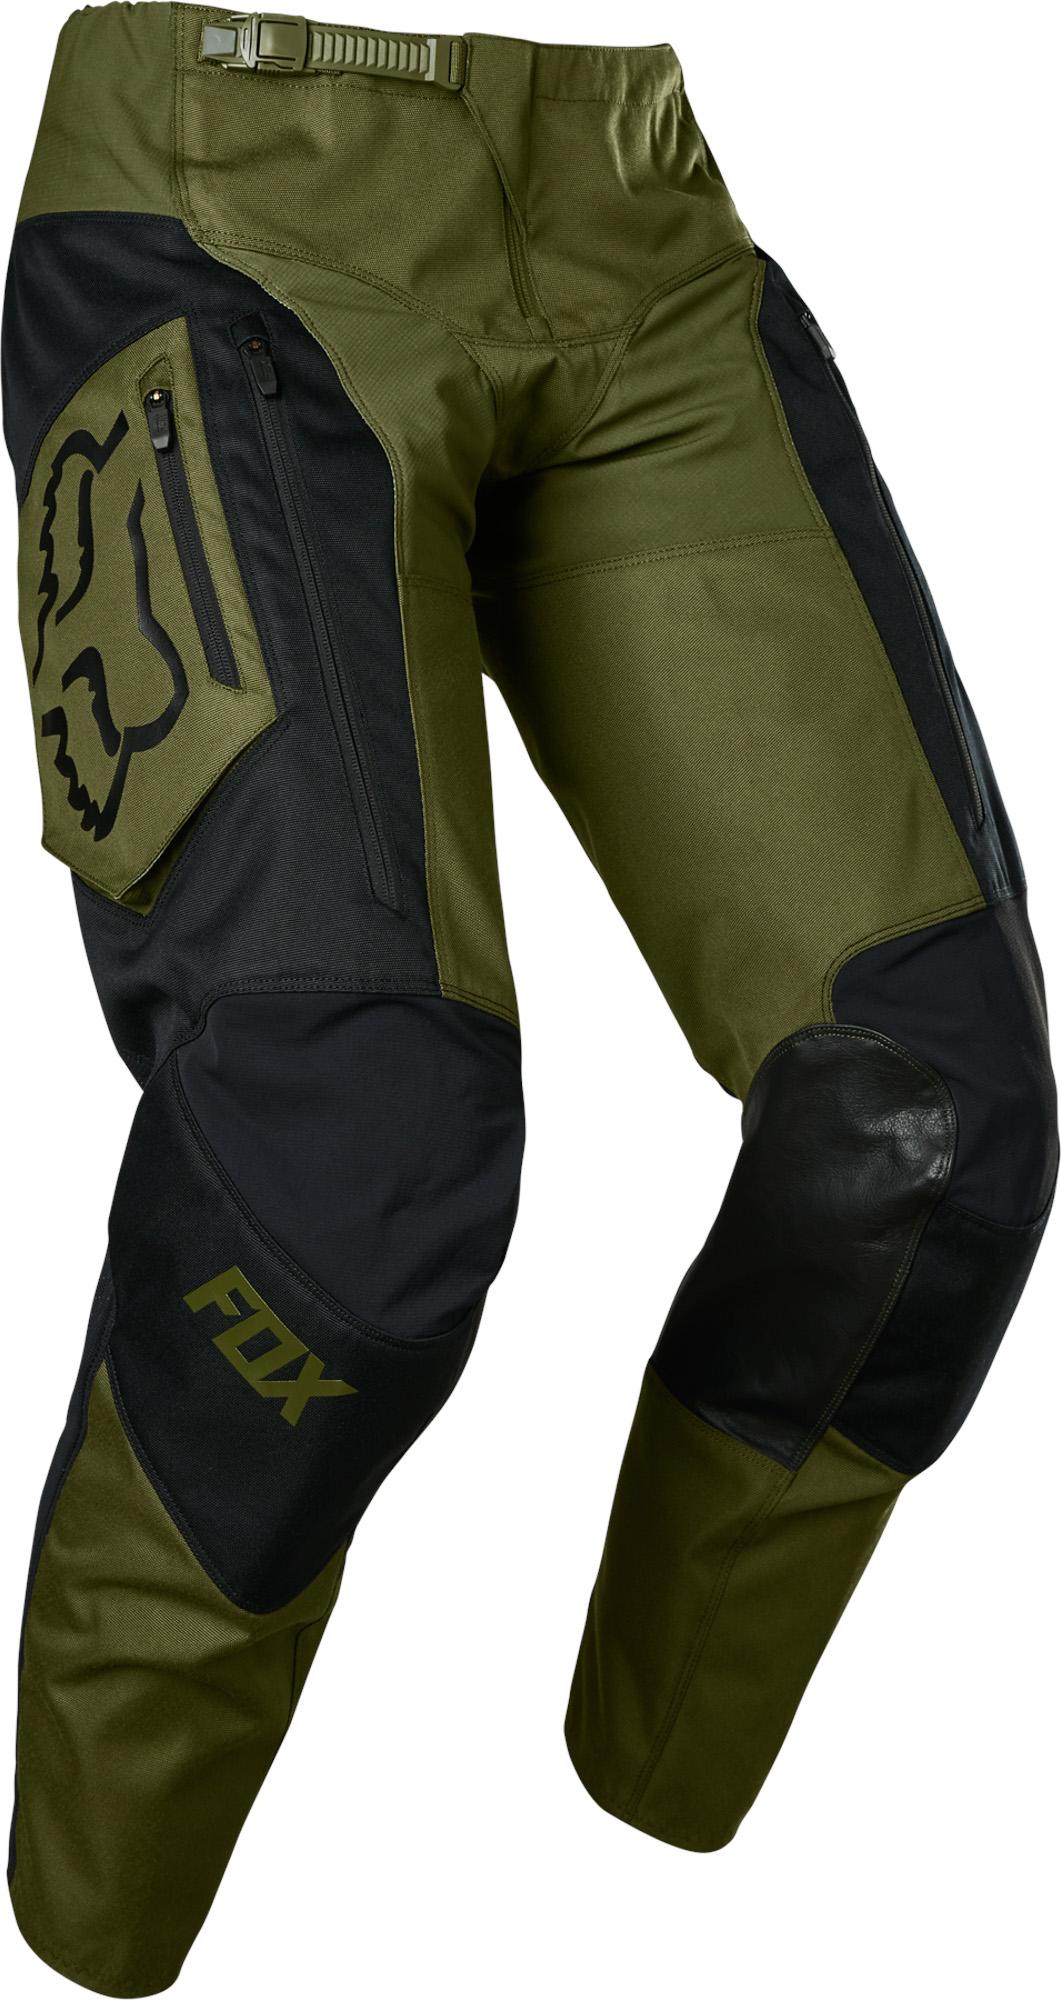 FOX Legion Lt Pant - Camo MX22